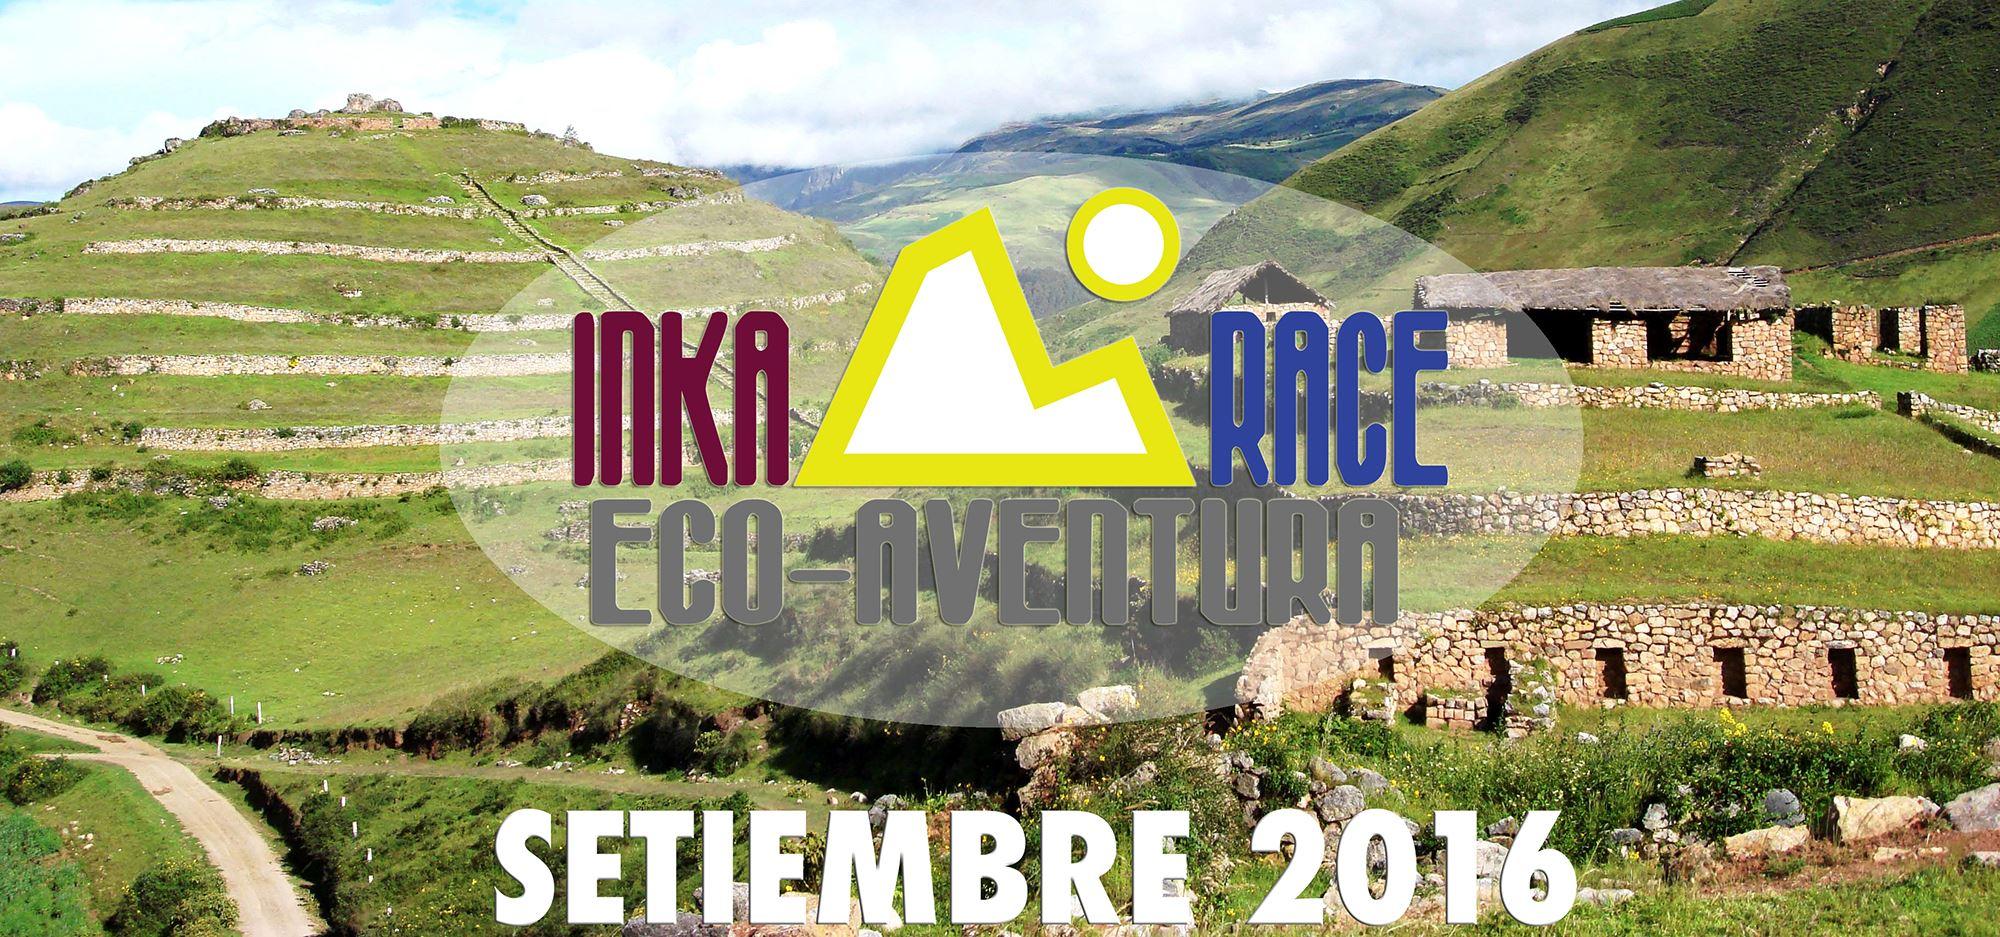 ecoaventura inka race